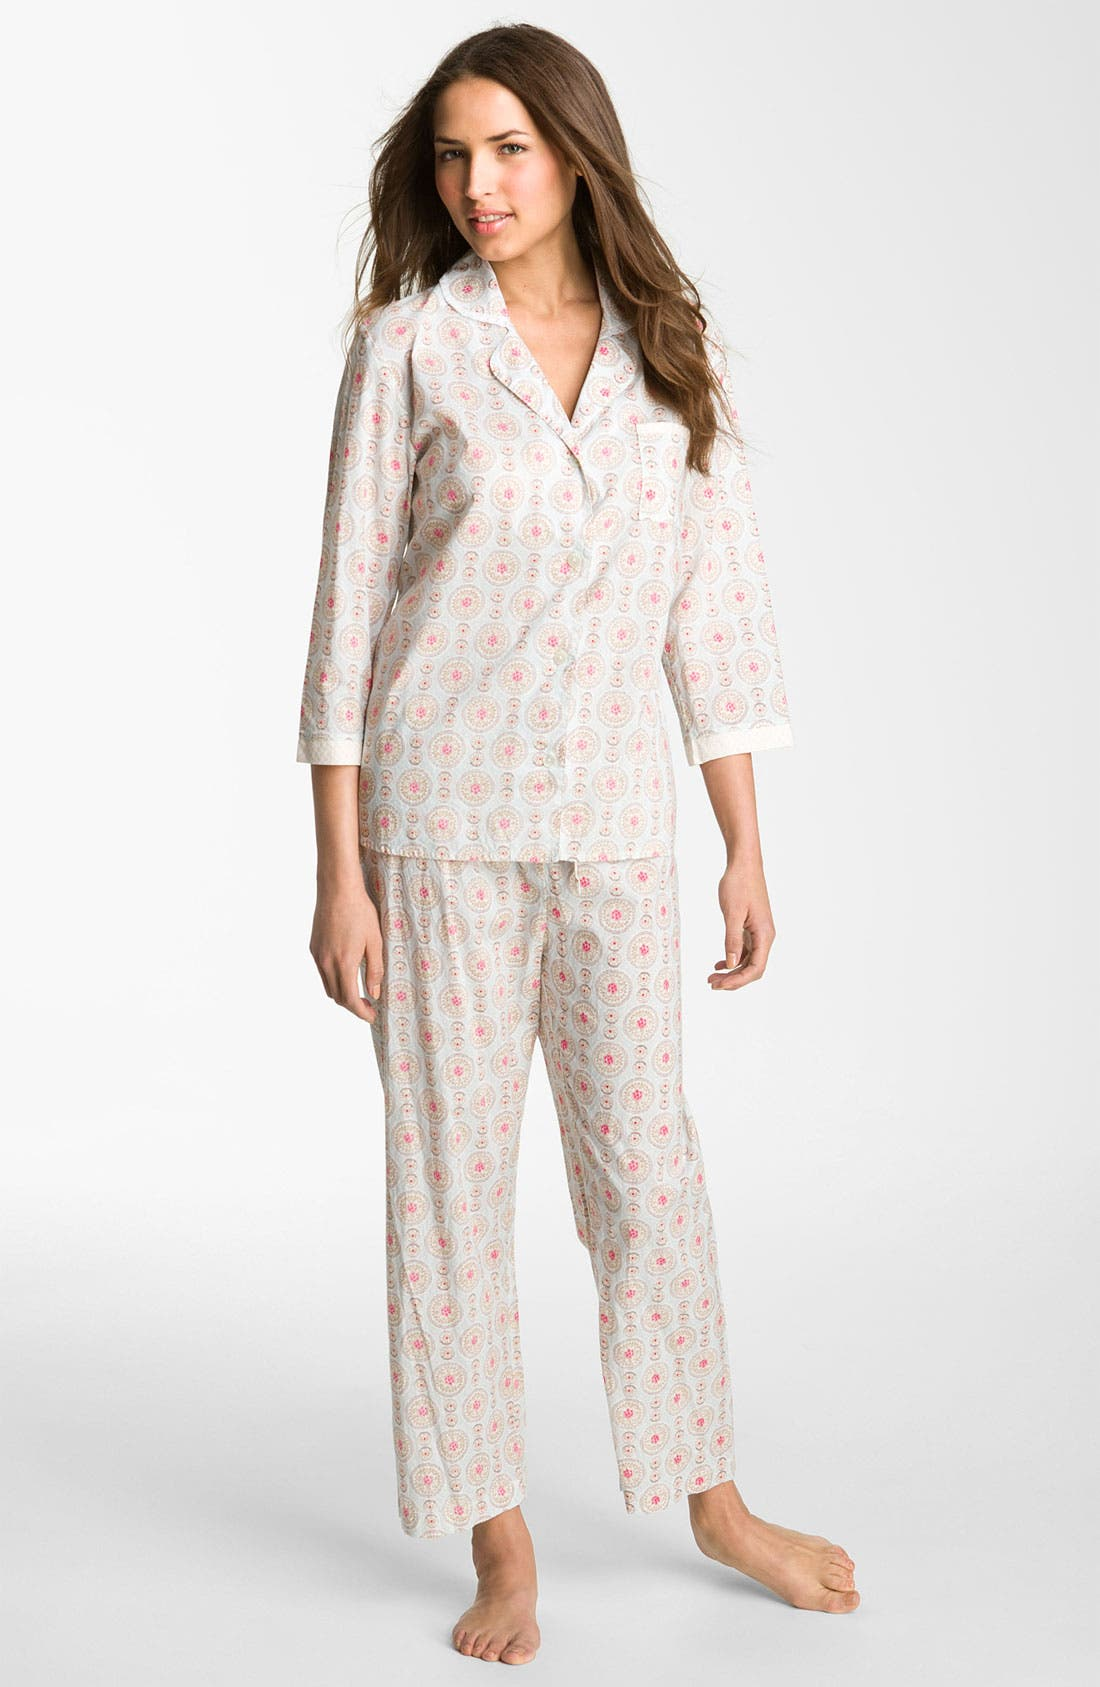 Alternate Image 1 Selected - Carole Hochman Designs 'Wood Cut Floral' Pajamas